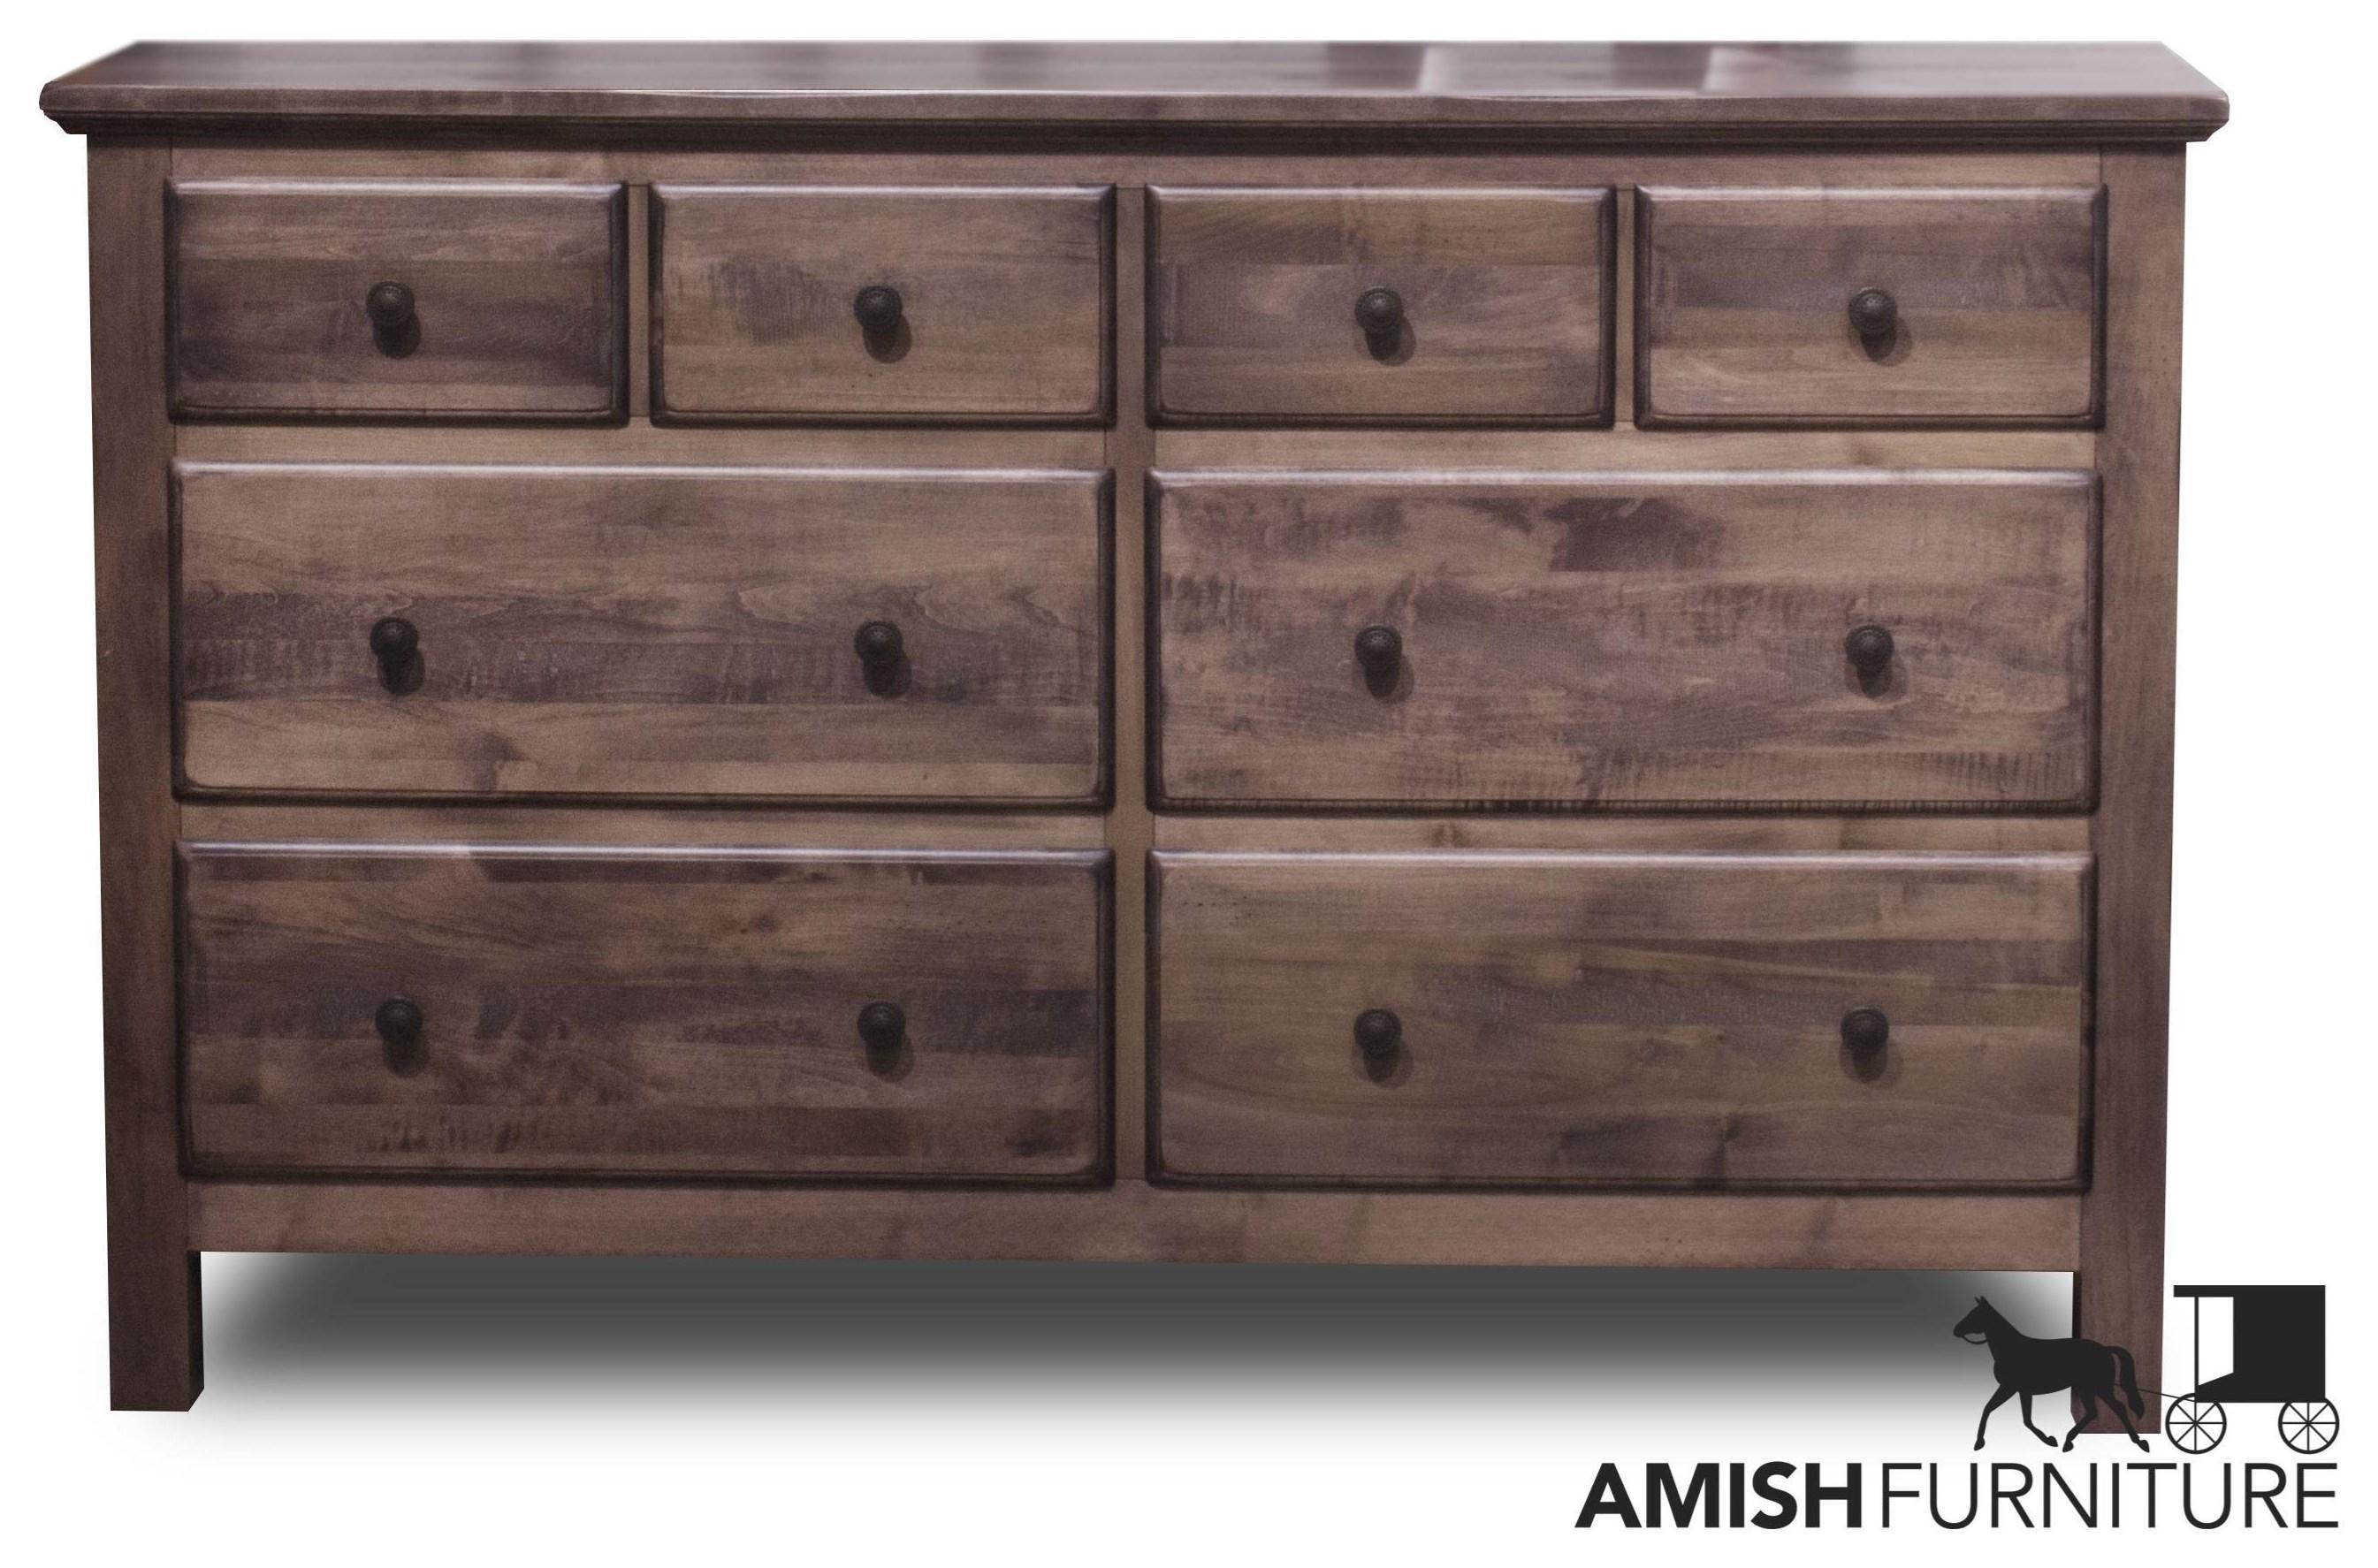 Lewiston 8 Drawer Dresser by Daniel's Amish at Ruby Gordon Home